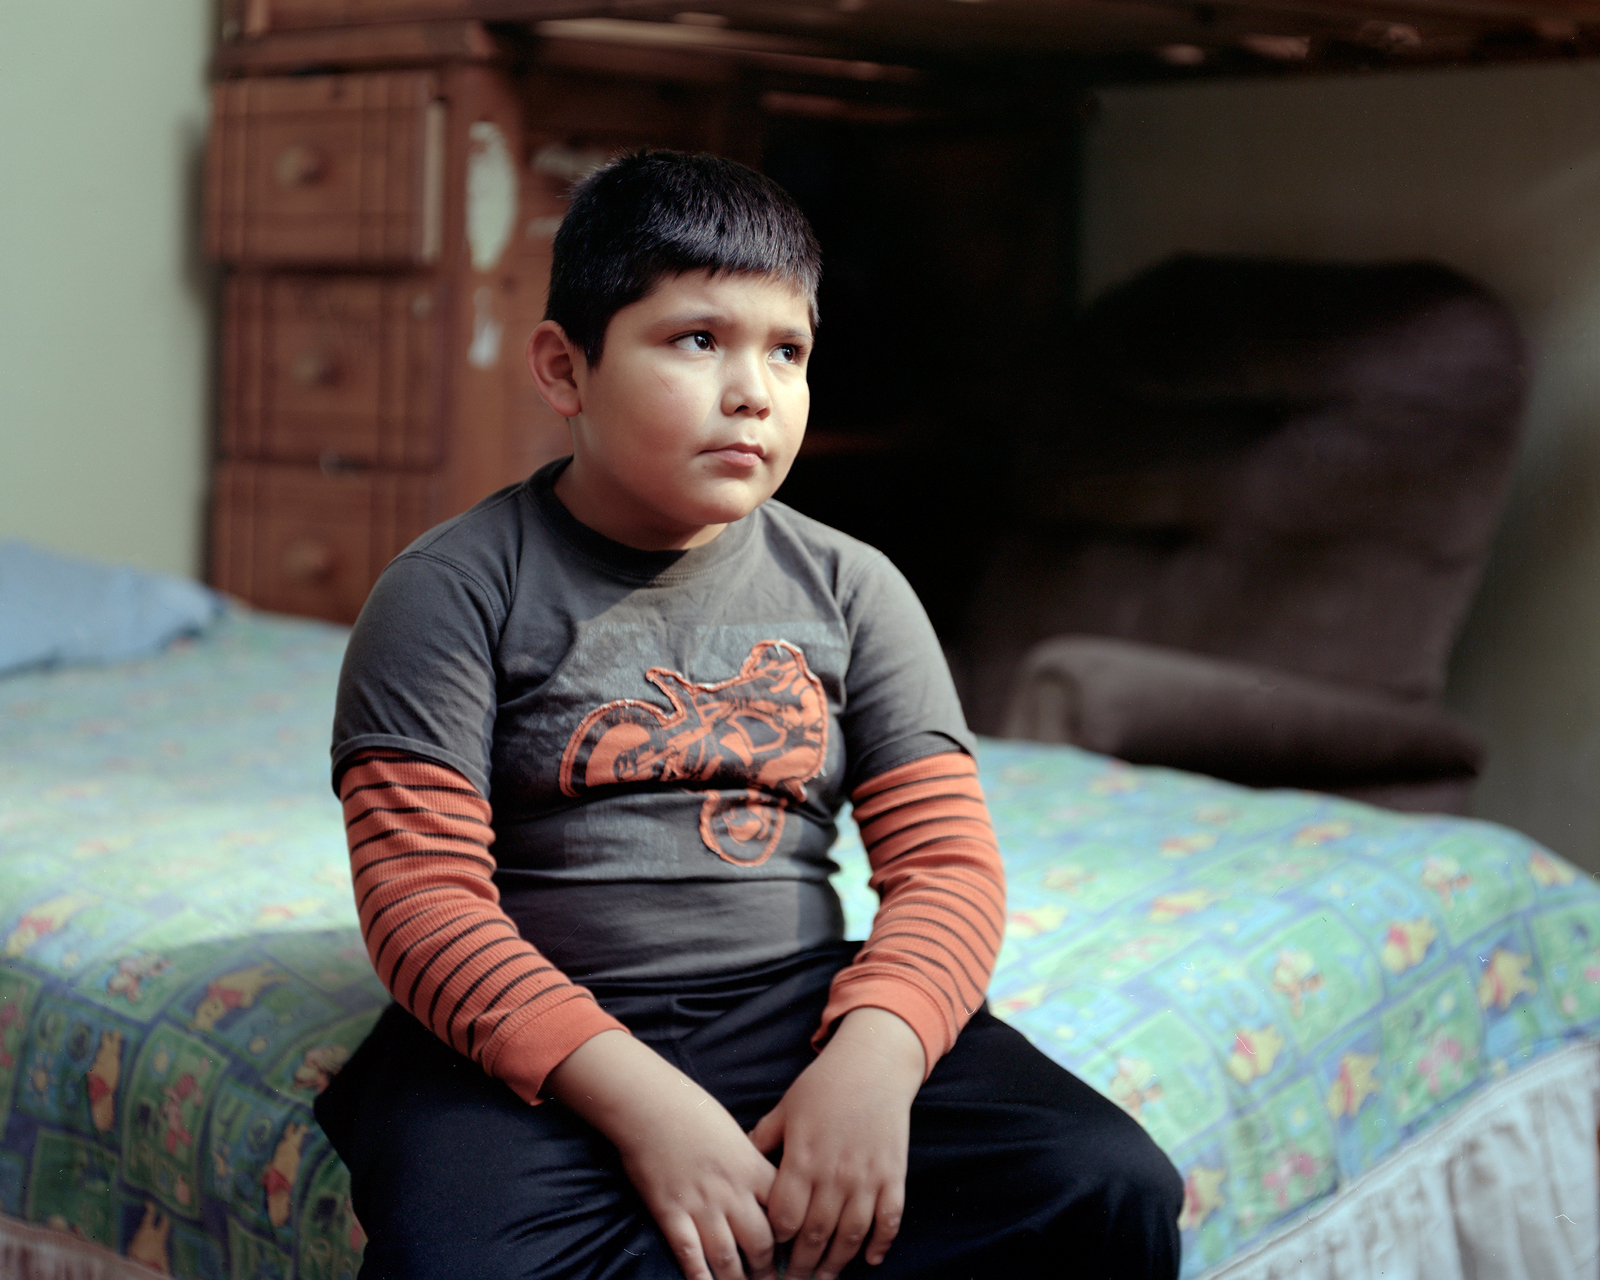 Miguel's Son, Hammond, IN, 2013 ©Juan Giraldo